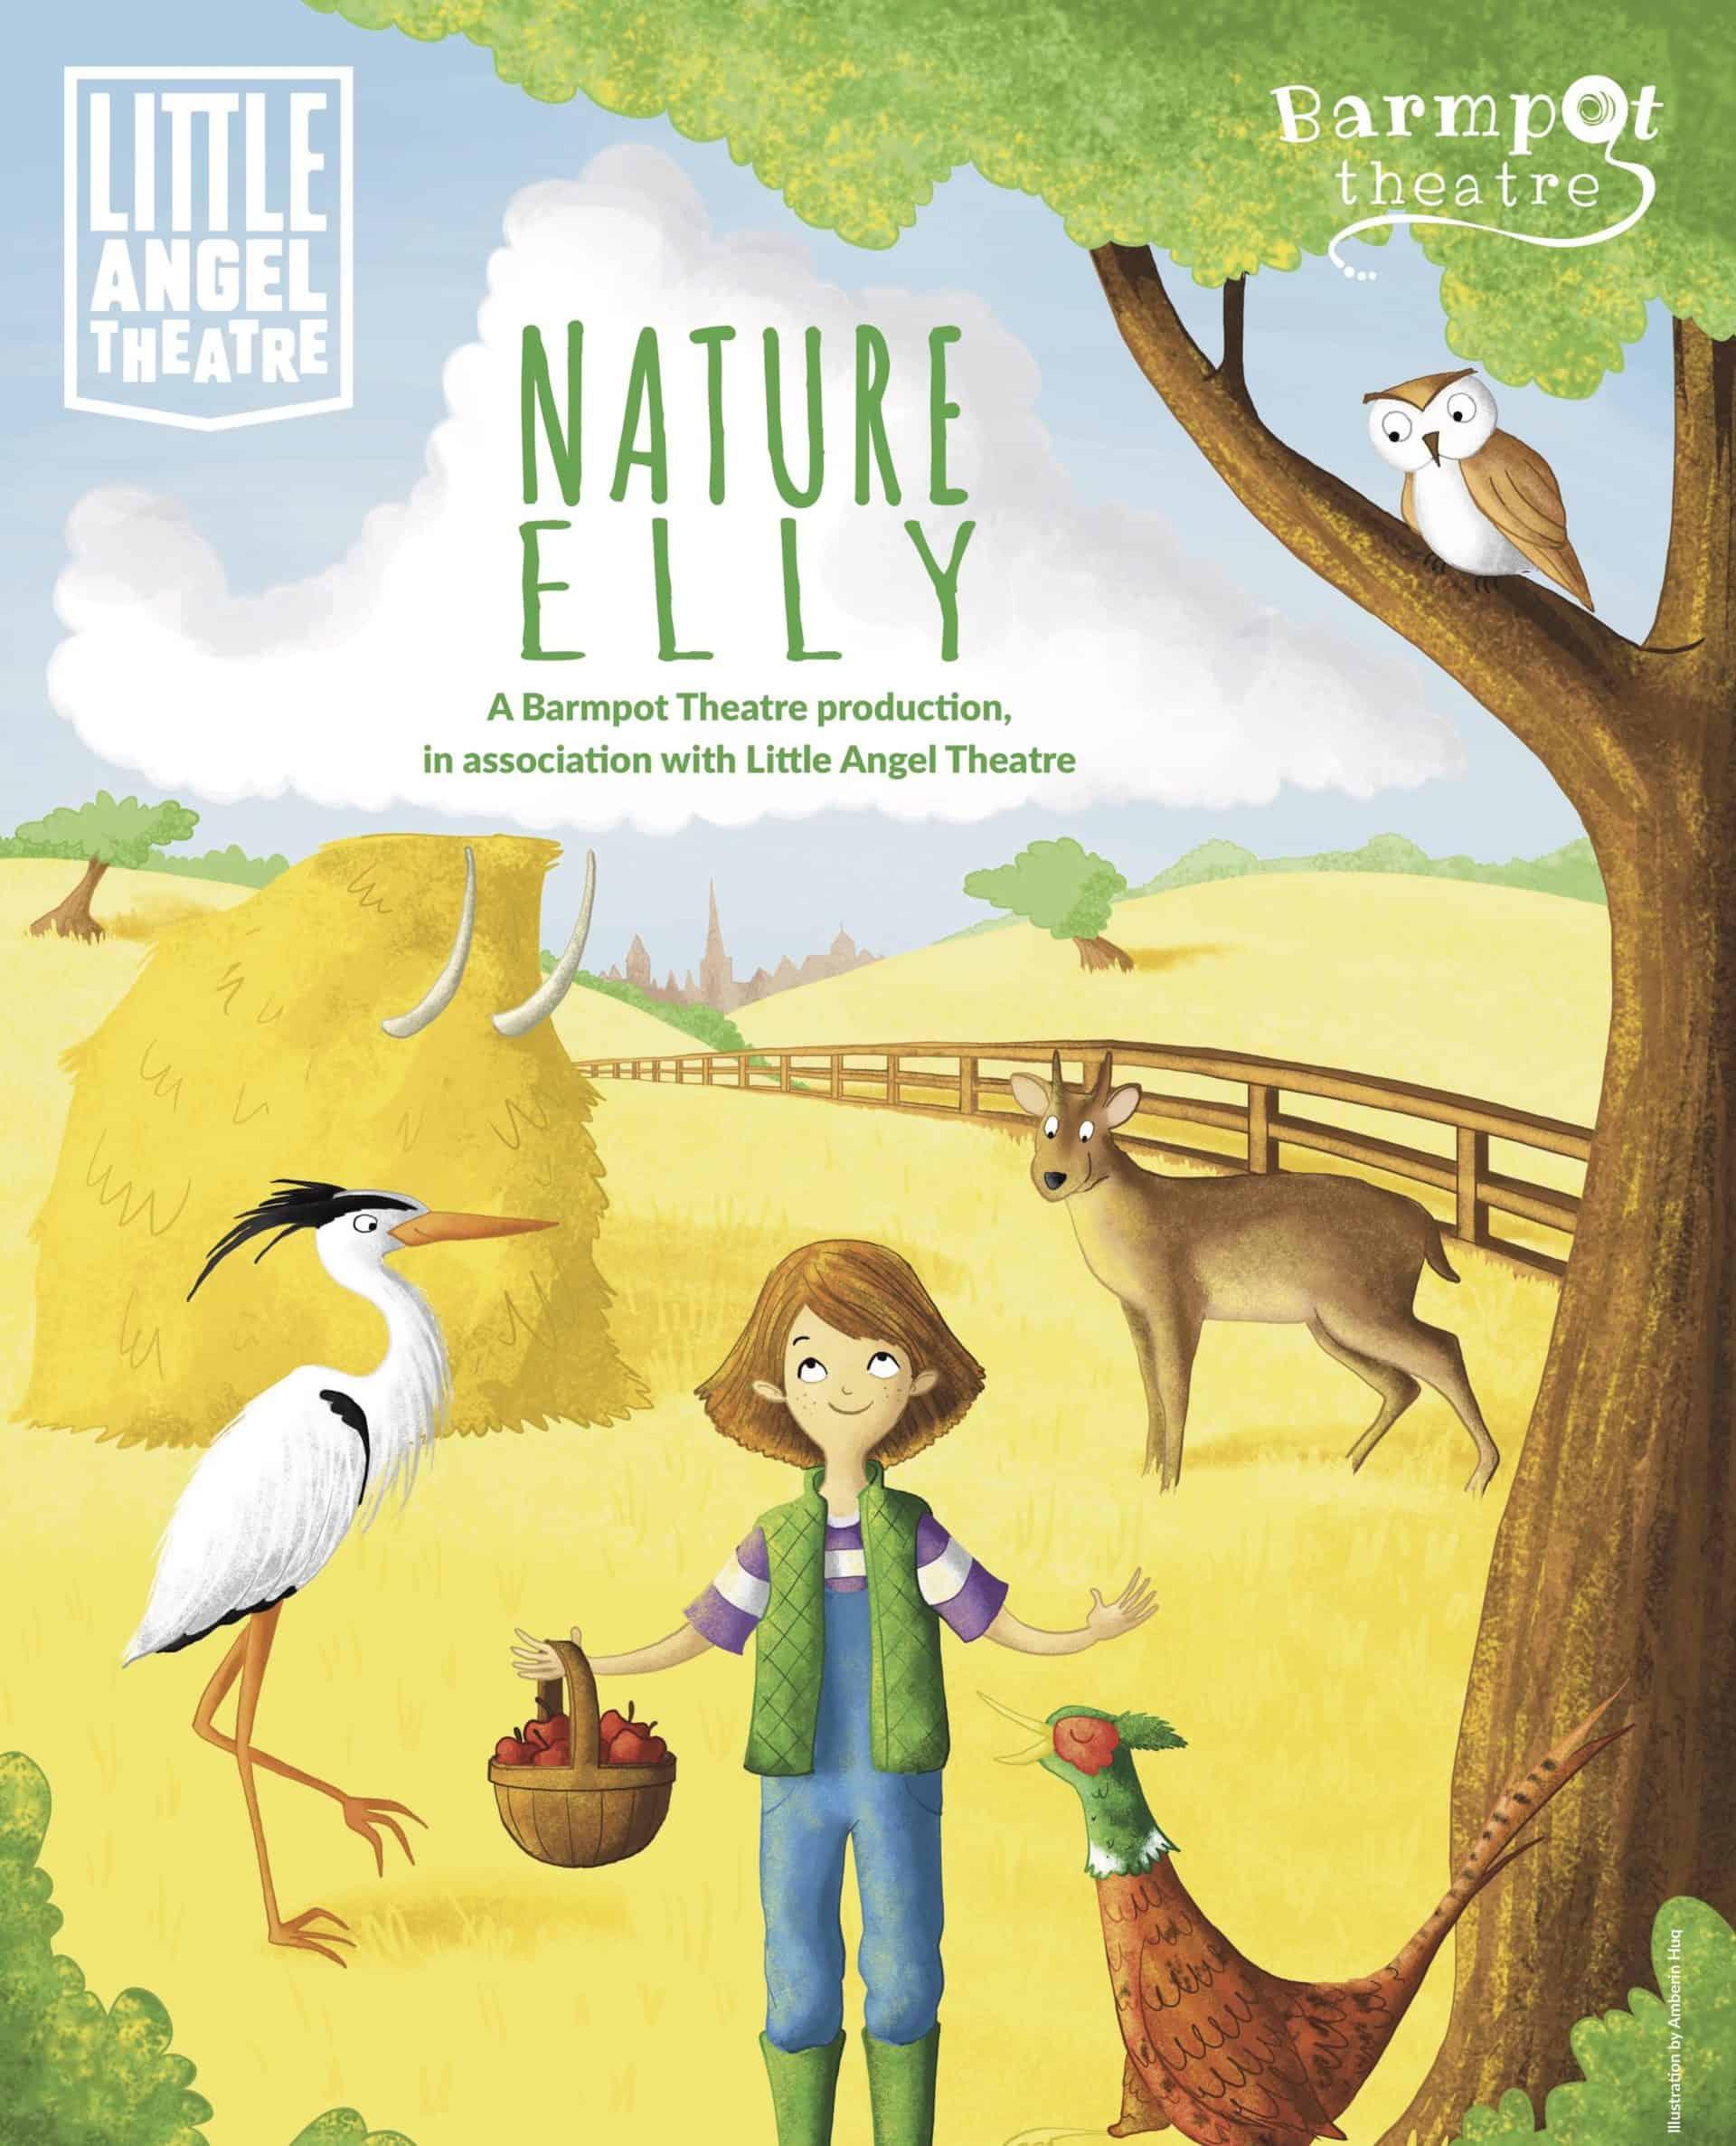 Barmpot Nature Elly